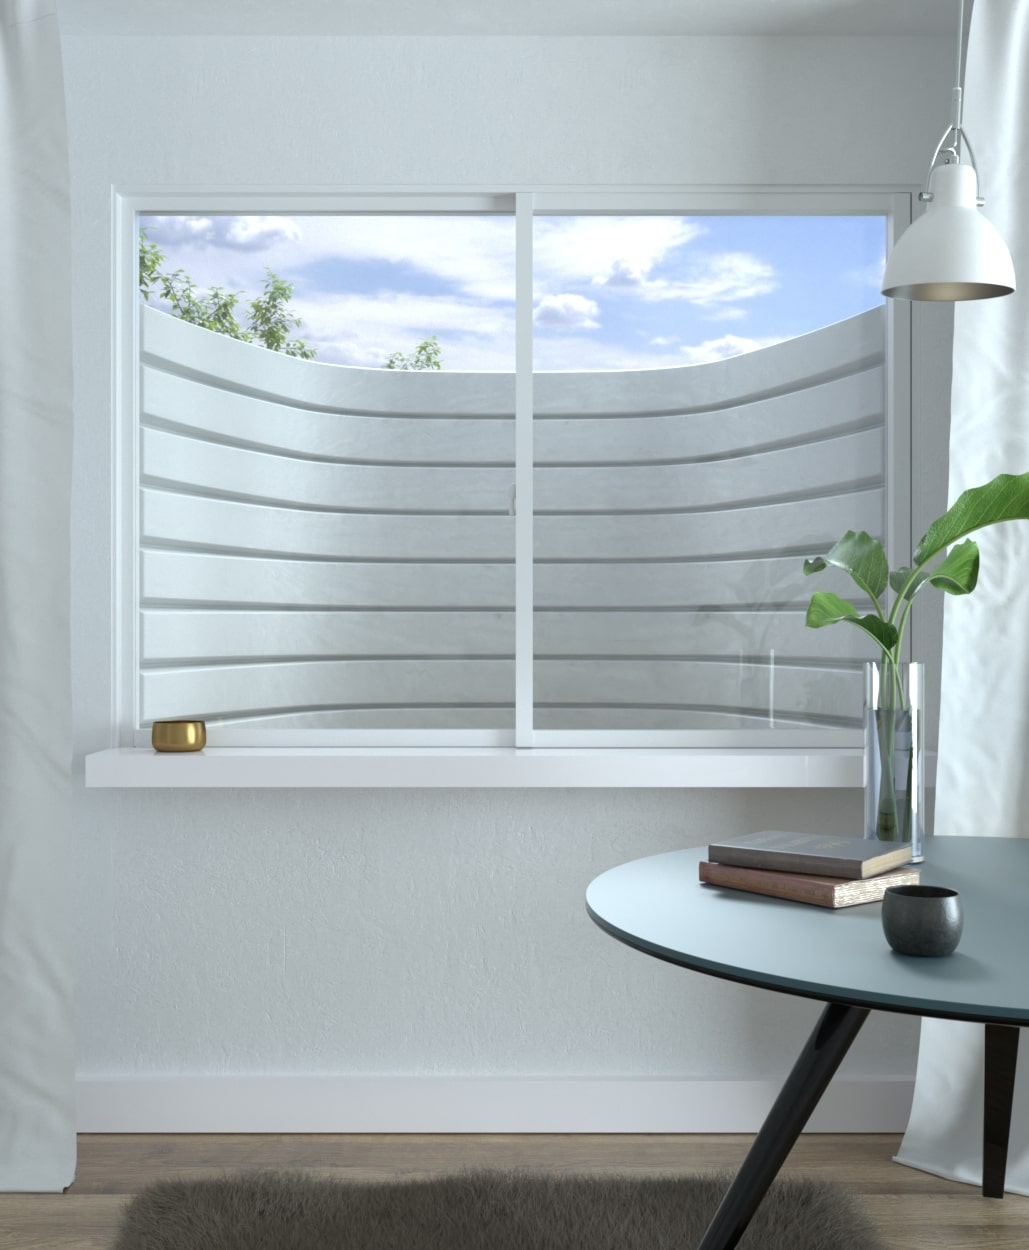 Denali dent-free window well